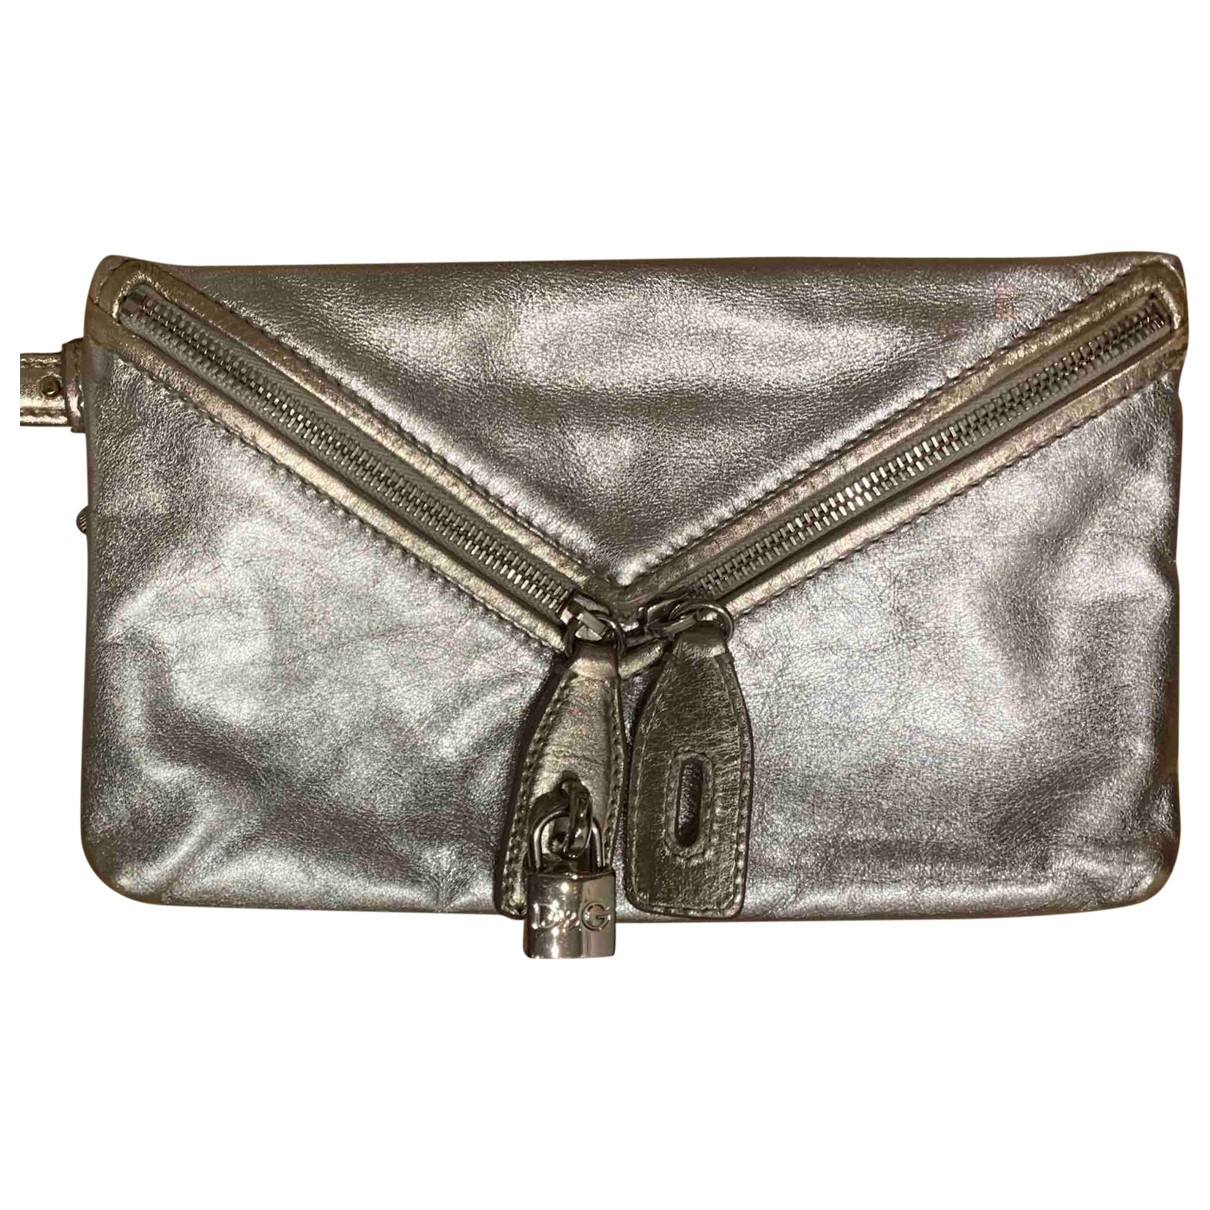 D&g \N Silver Leather Clutch bag for Women \N